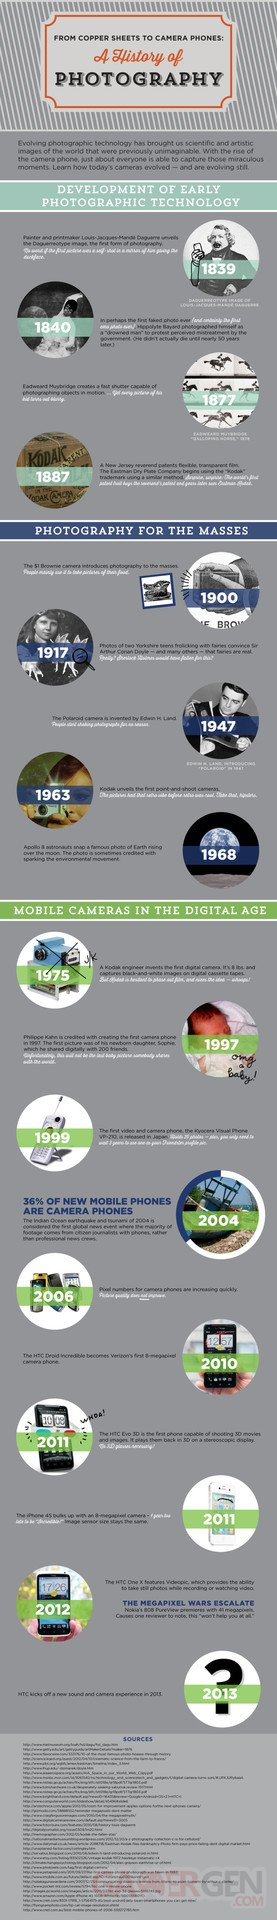 infographie-htc-histoire-photographie.